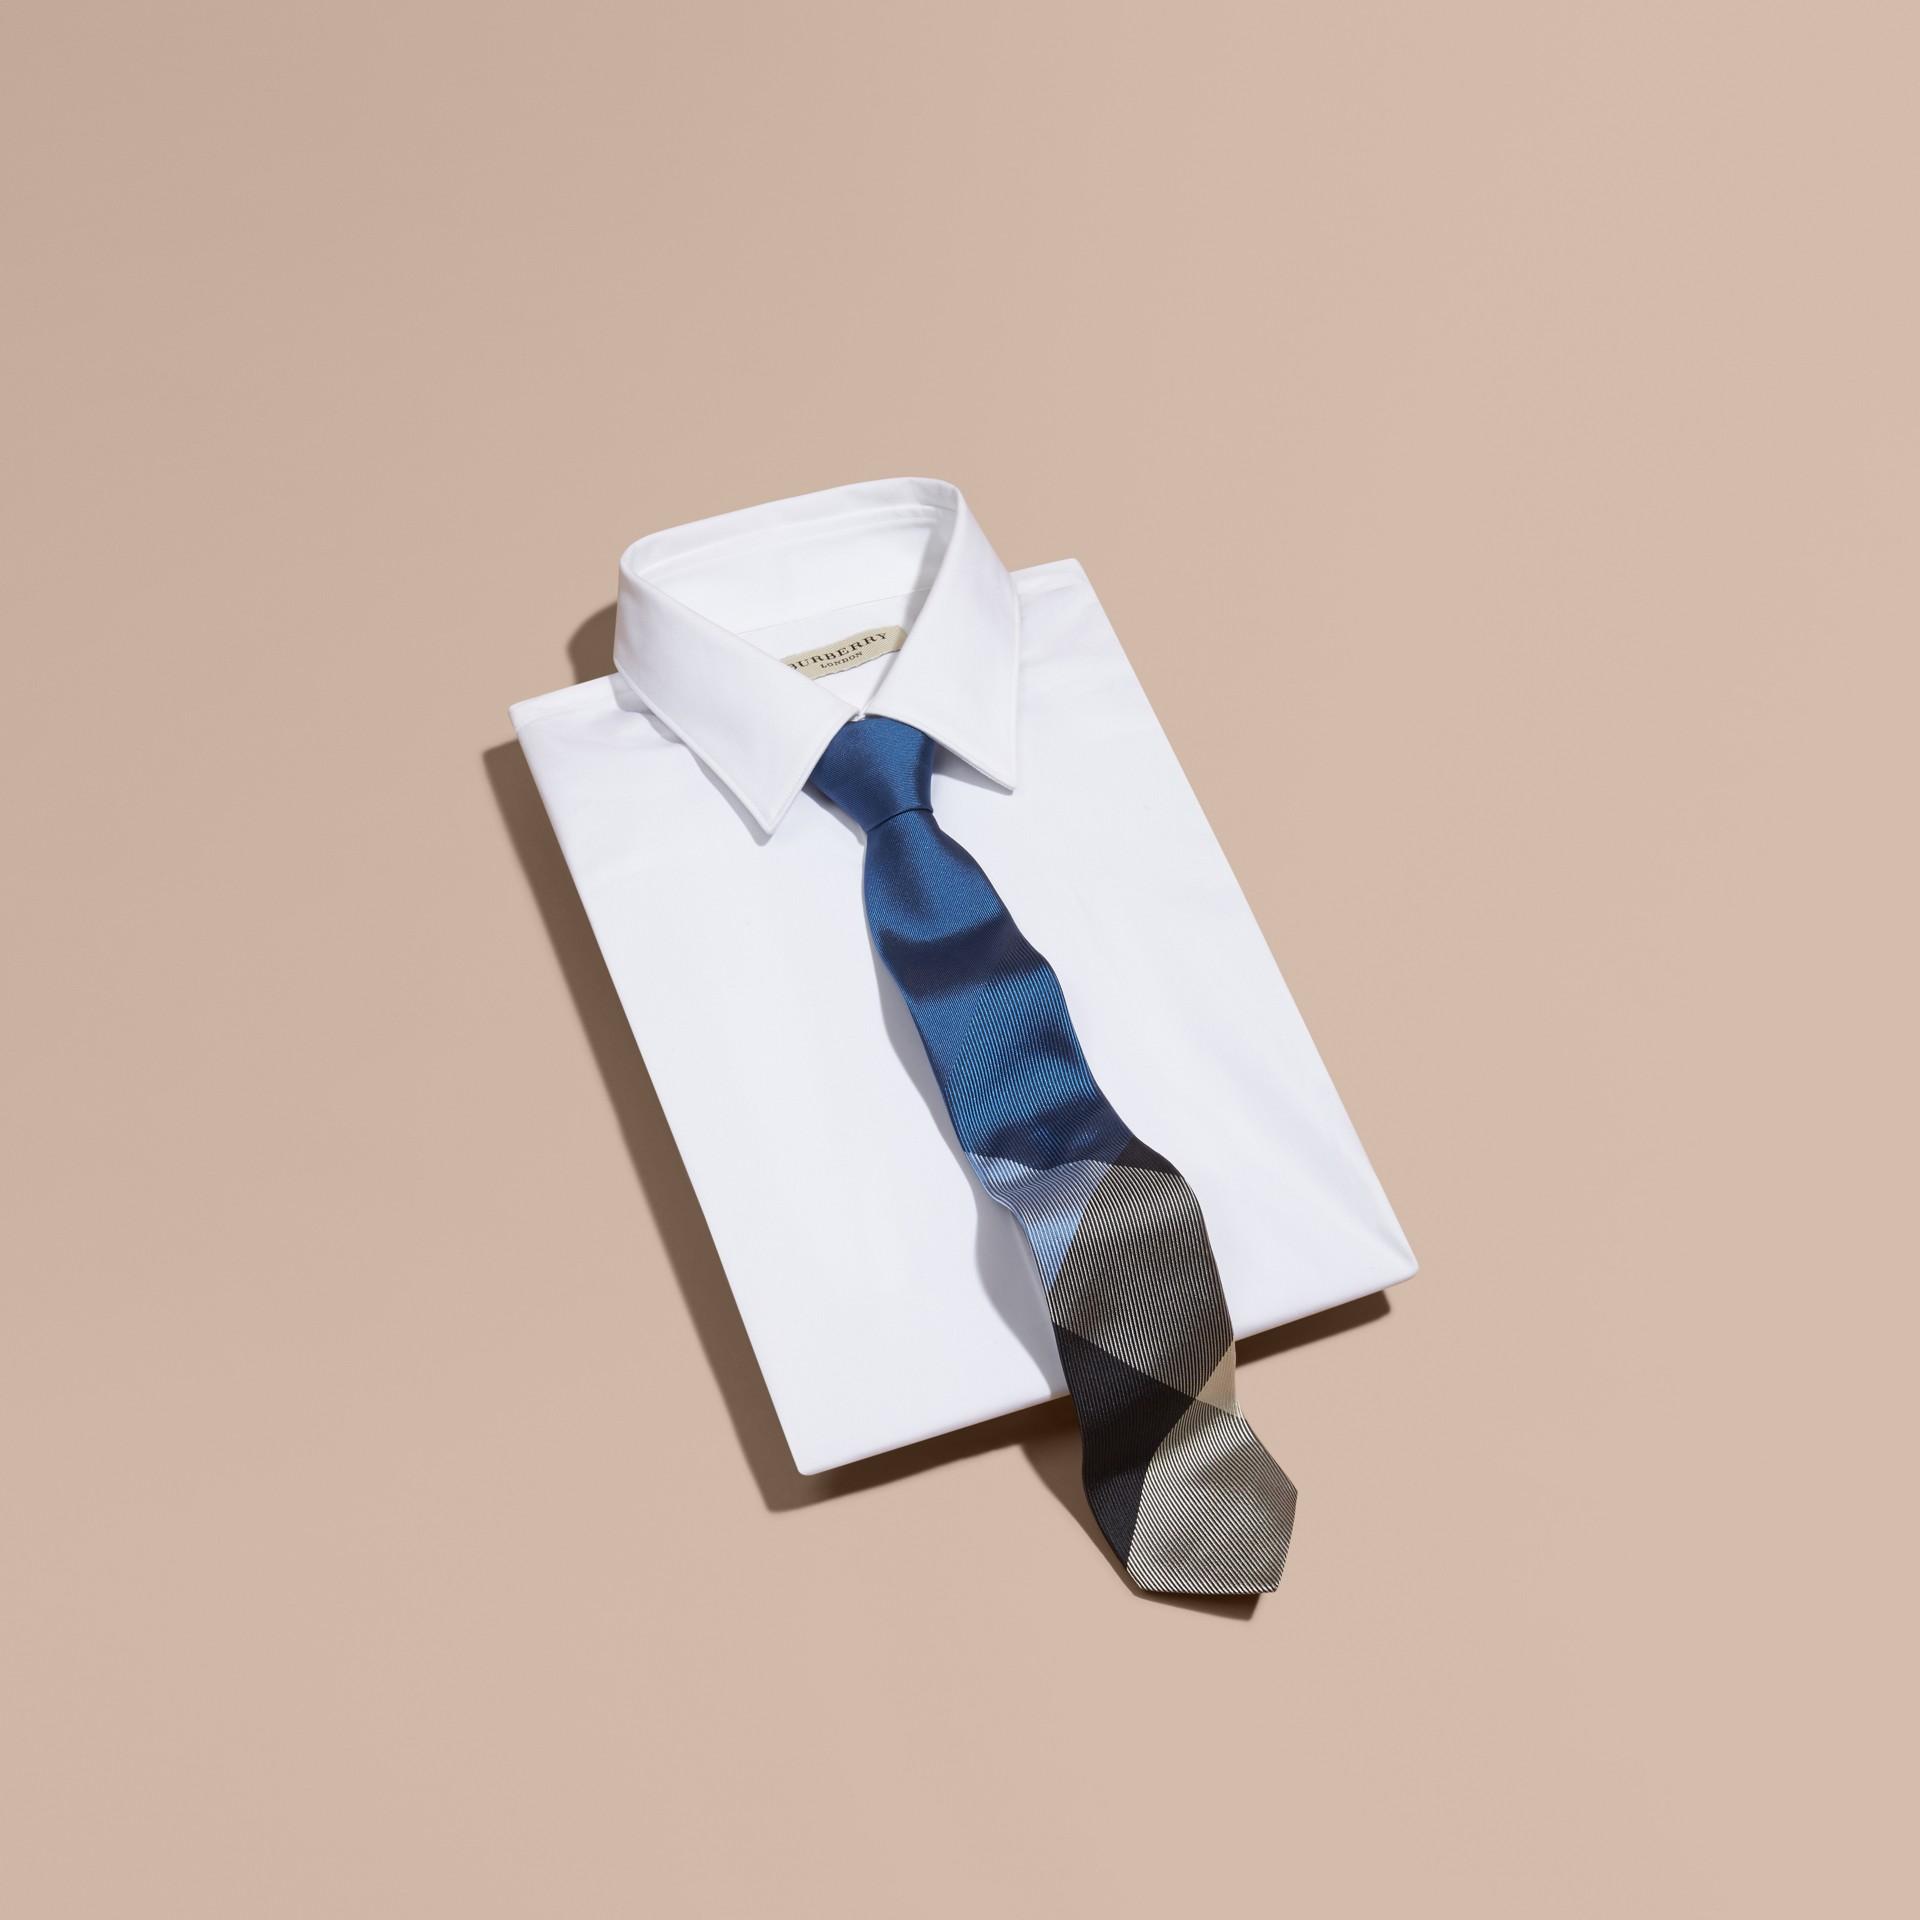 Hydrangea blue Modern Cut Check Jacquard Silk Tie Hydrangea Blue - gallery image 3